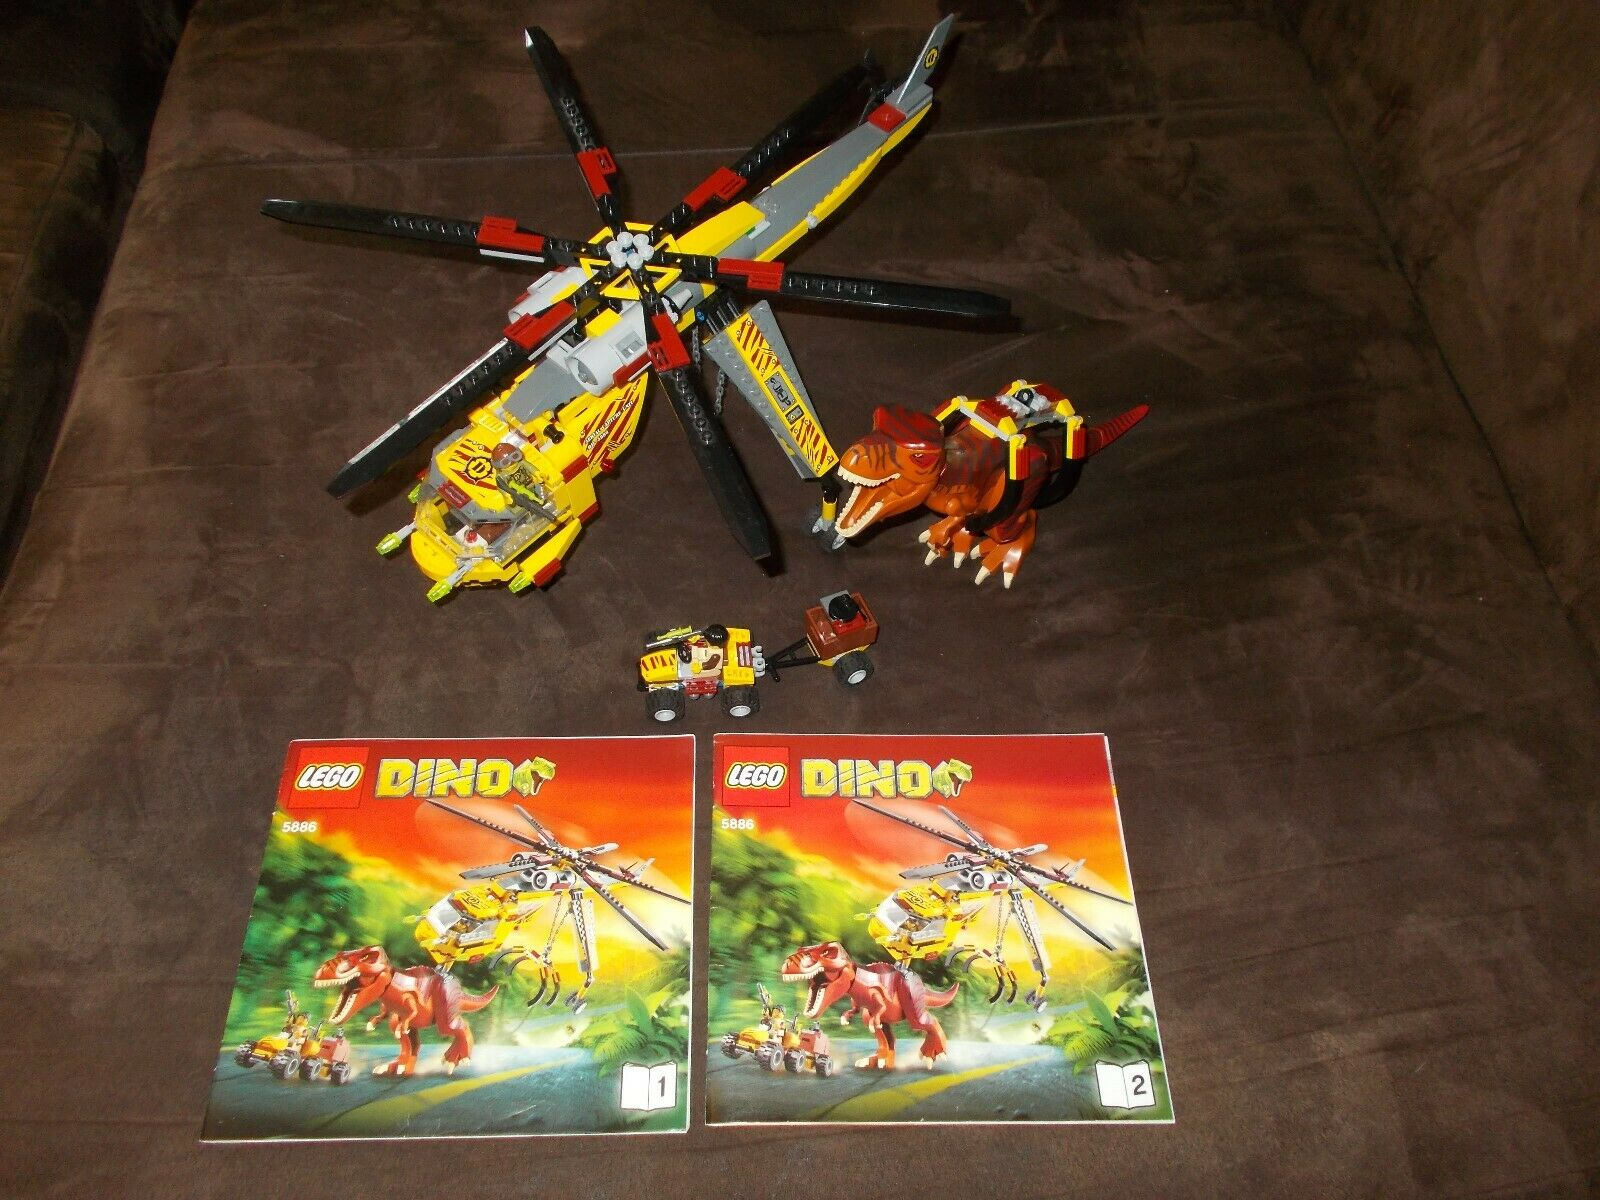 Lego® Dino - 5886 - T-Rex Transport-Helikopter - mit Bauanleitung (BA)